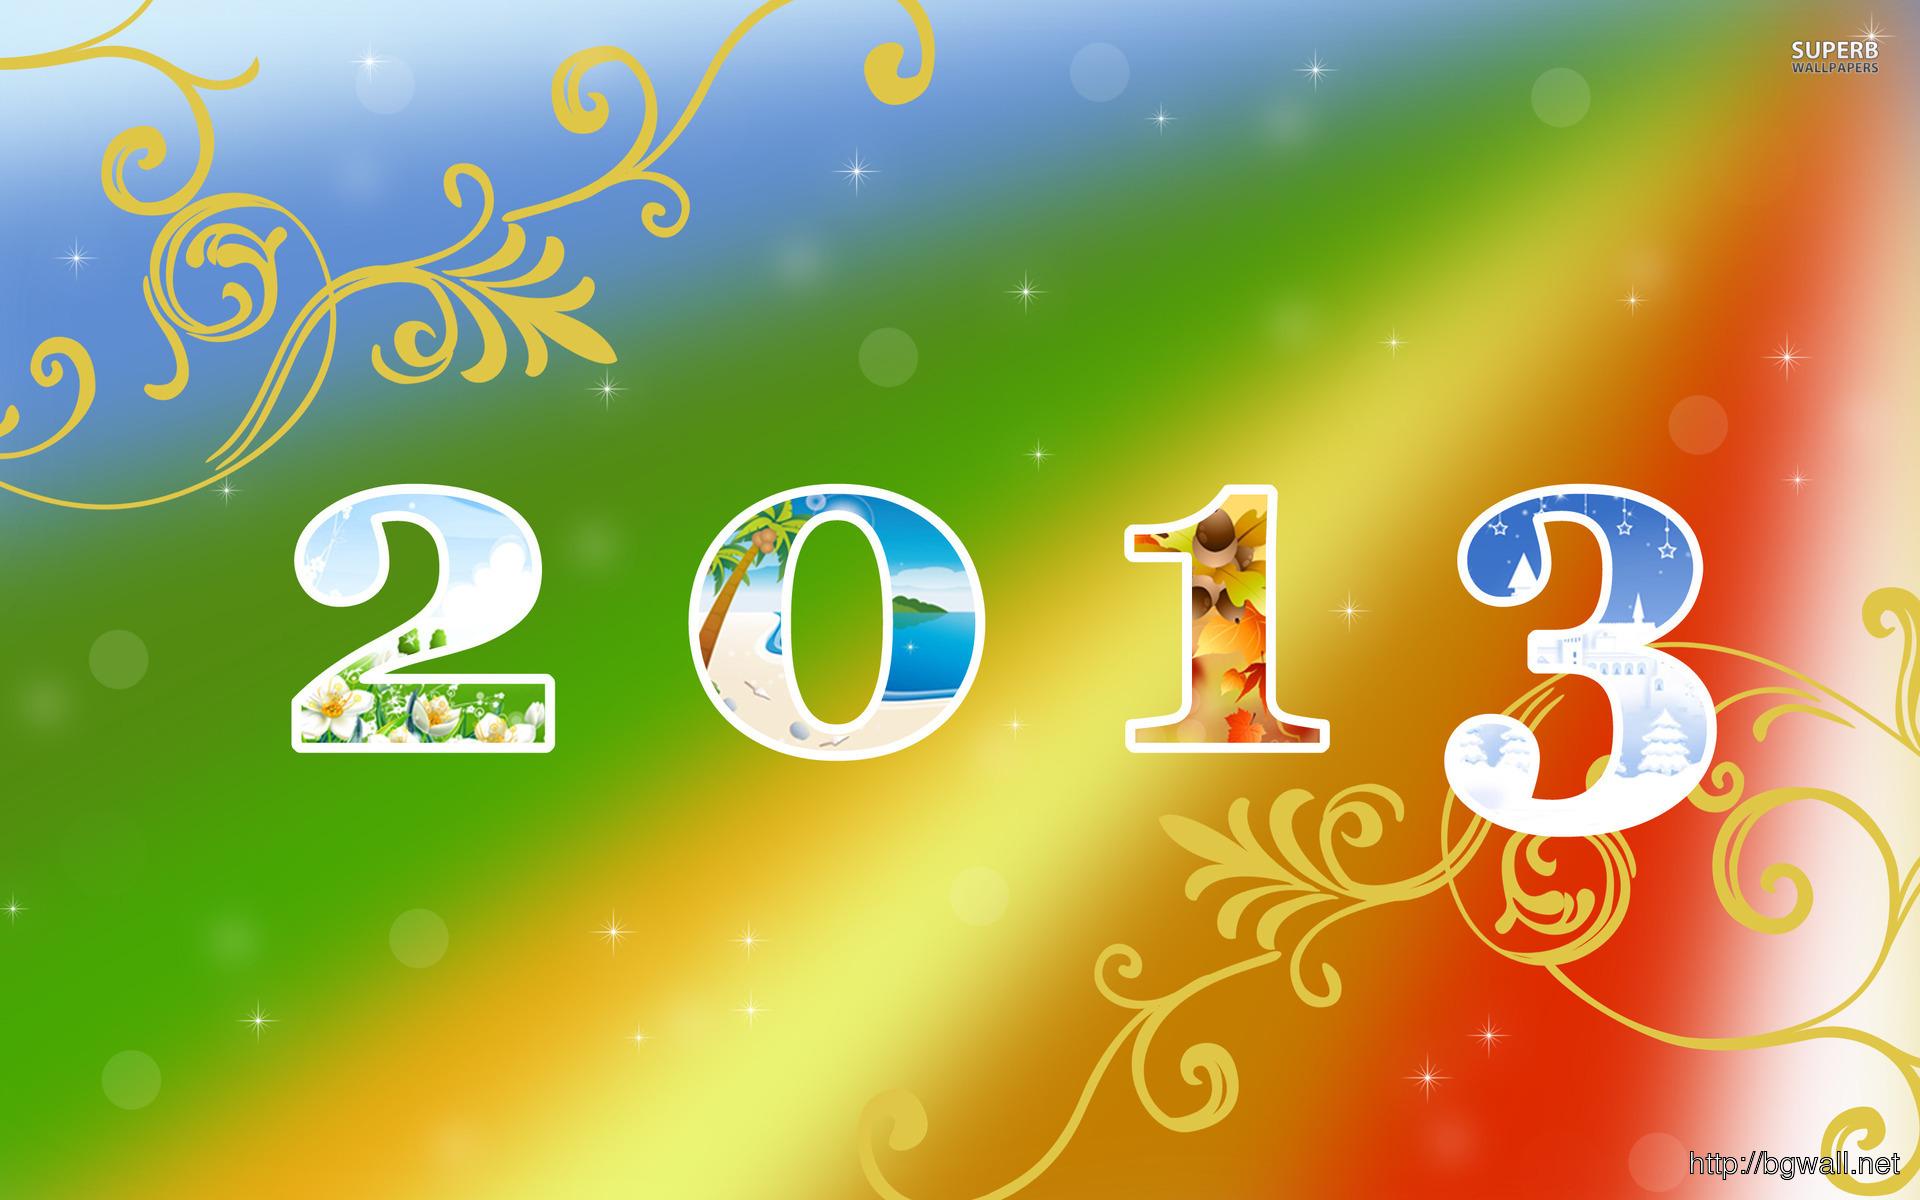 Happy New Year 2013 Wallpaper Full Size